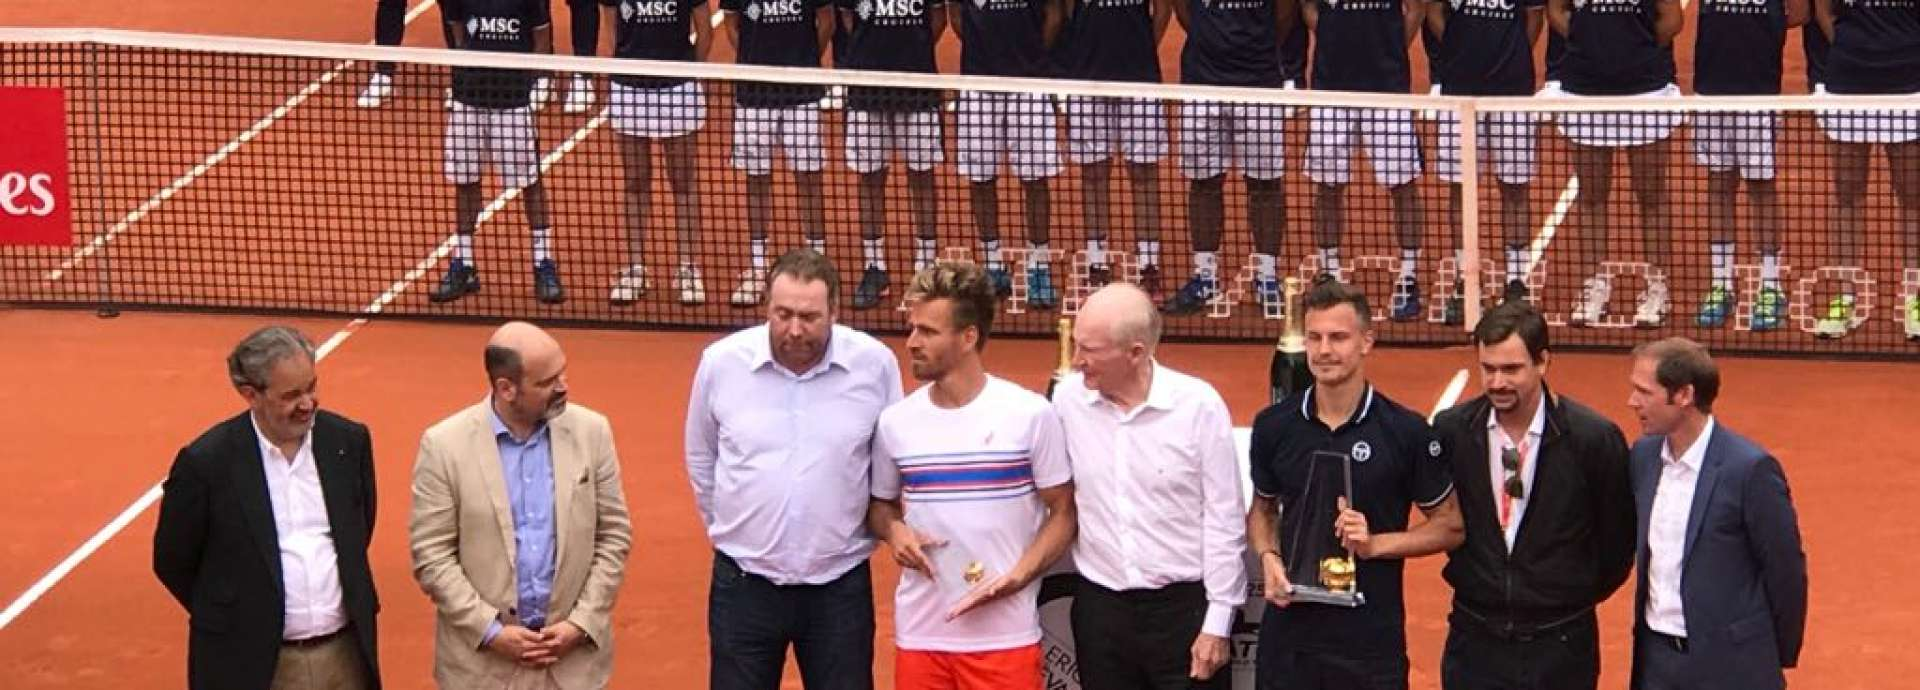 moser-vernet-cie-geneve-06/2018-article-tennis-3